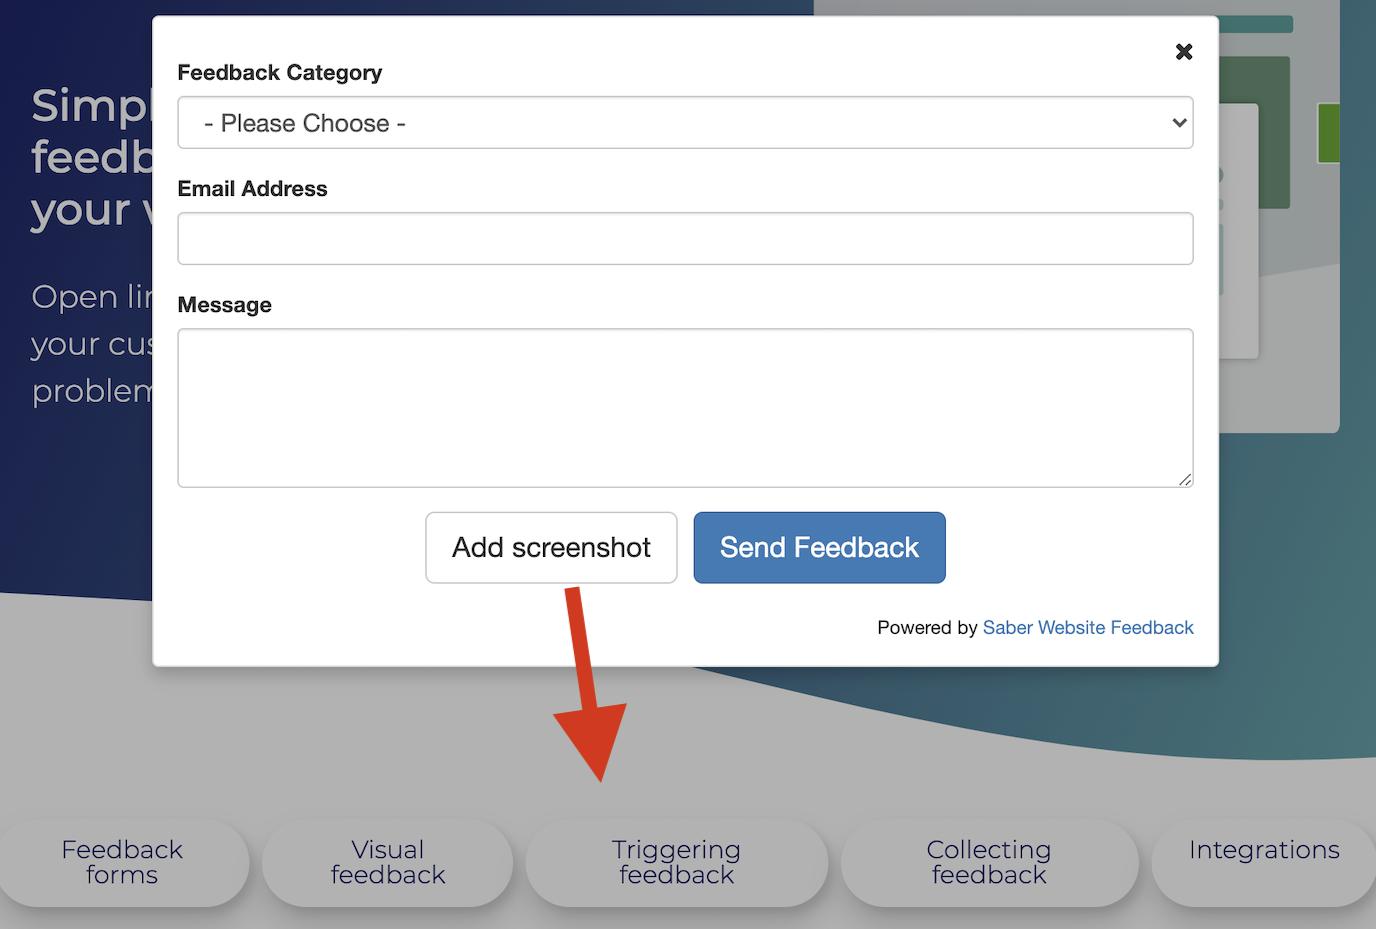 Saber Feedback screenshot functionality